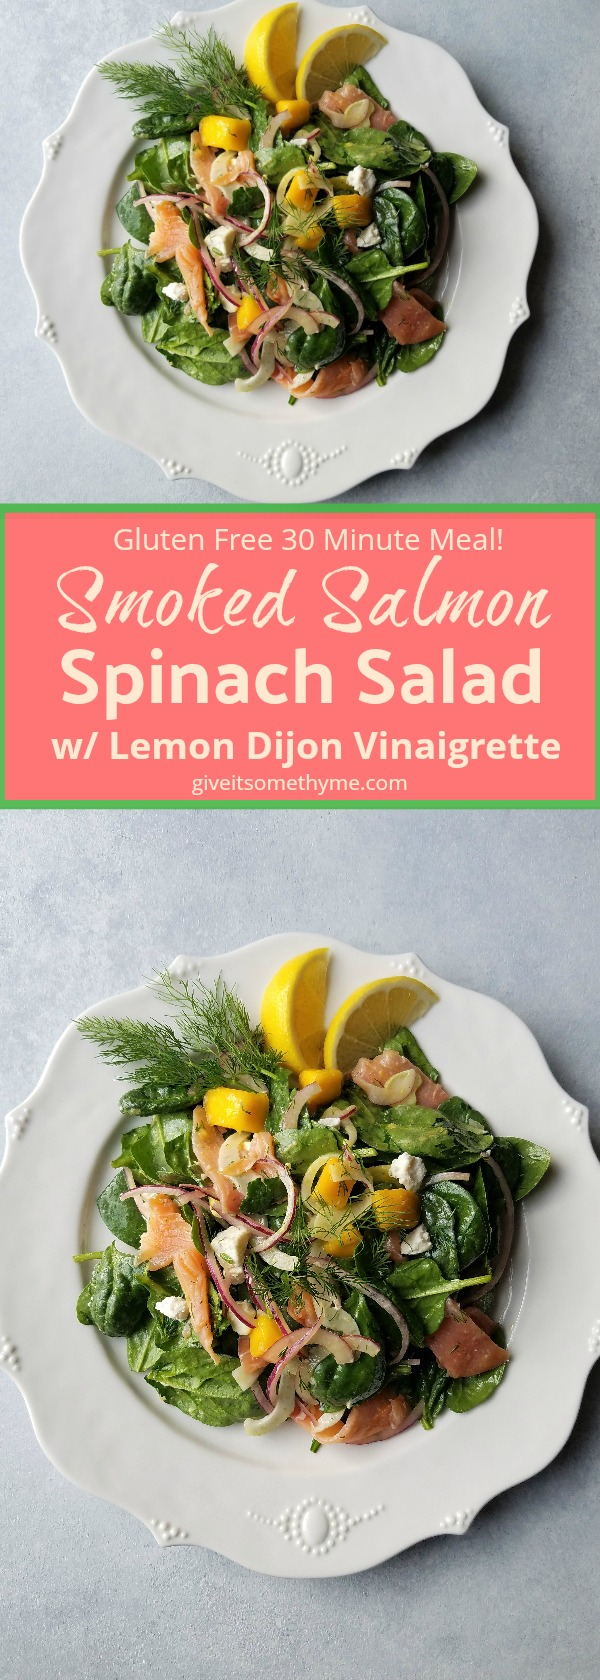 Smoked Salmon Spinach Salad w/ Lemon Dijon Vinaigrette - Give it Some Thyme